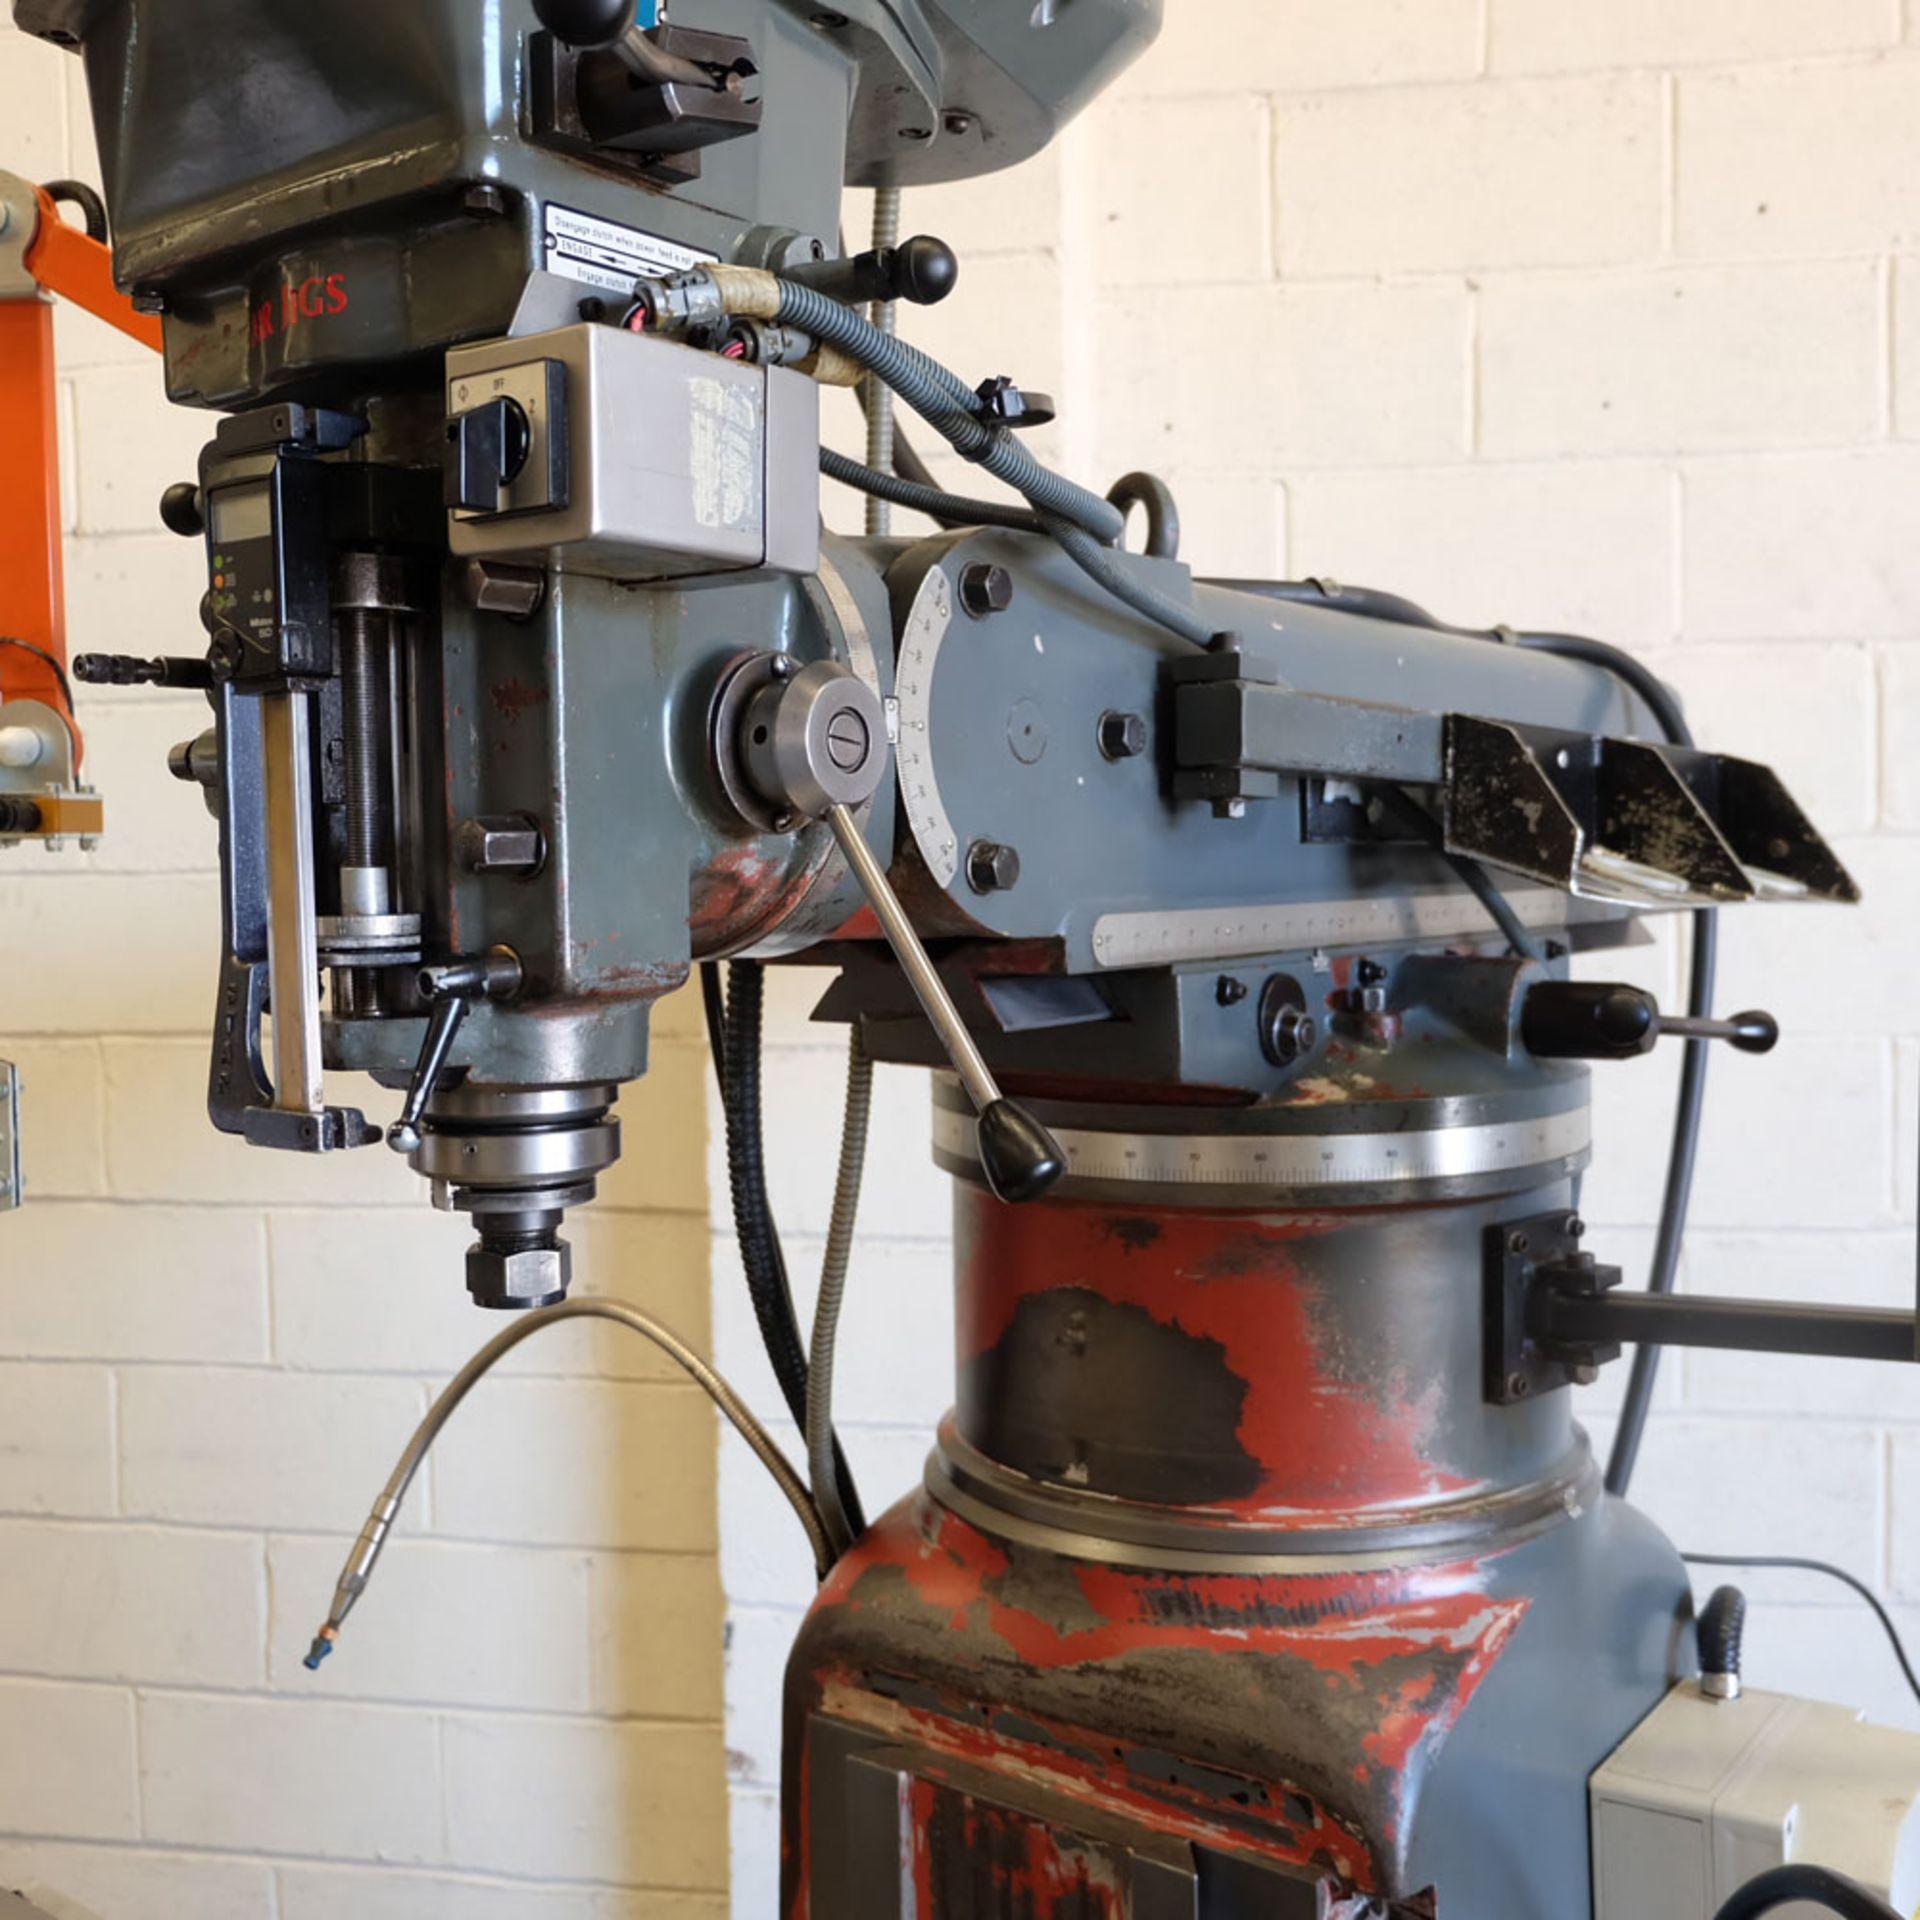 AJAX Model AJT.4 Turret Milling Machine. Table Size: 1372 x 280mm. - Image 4 of 8